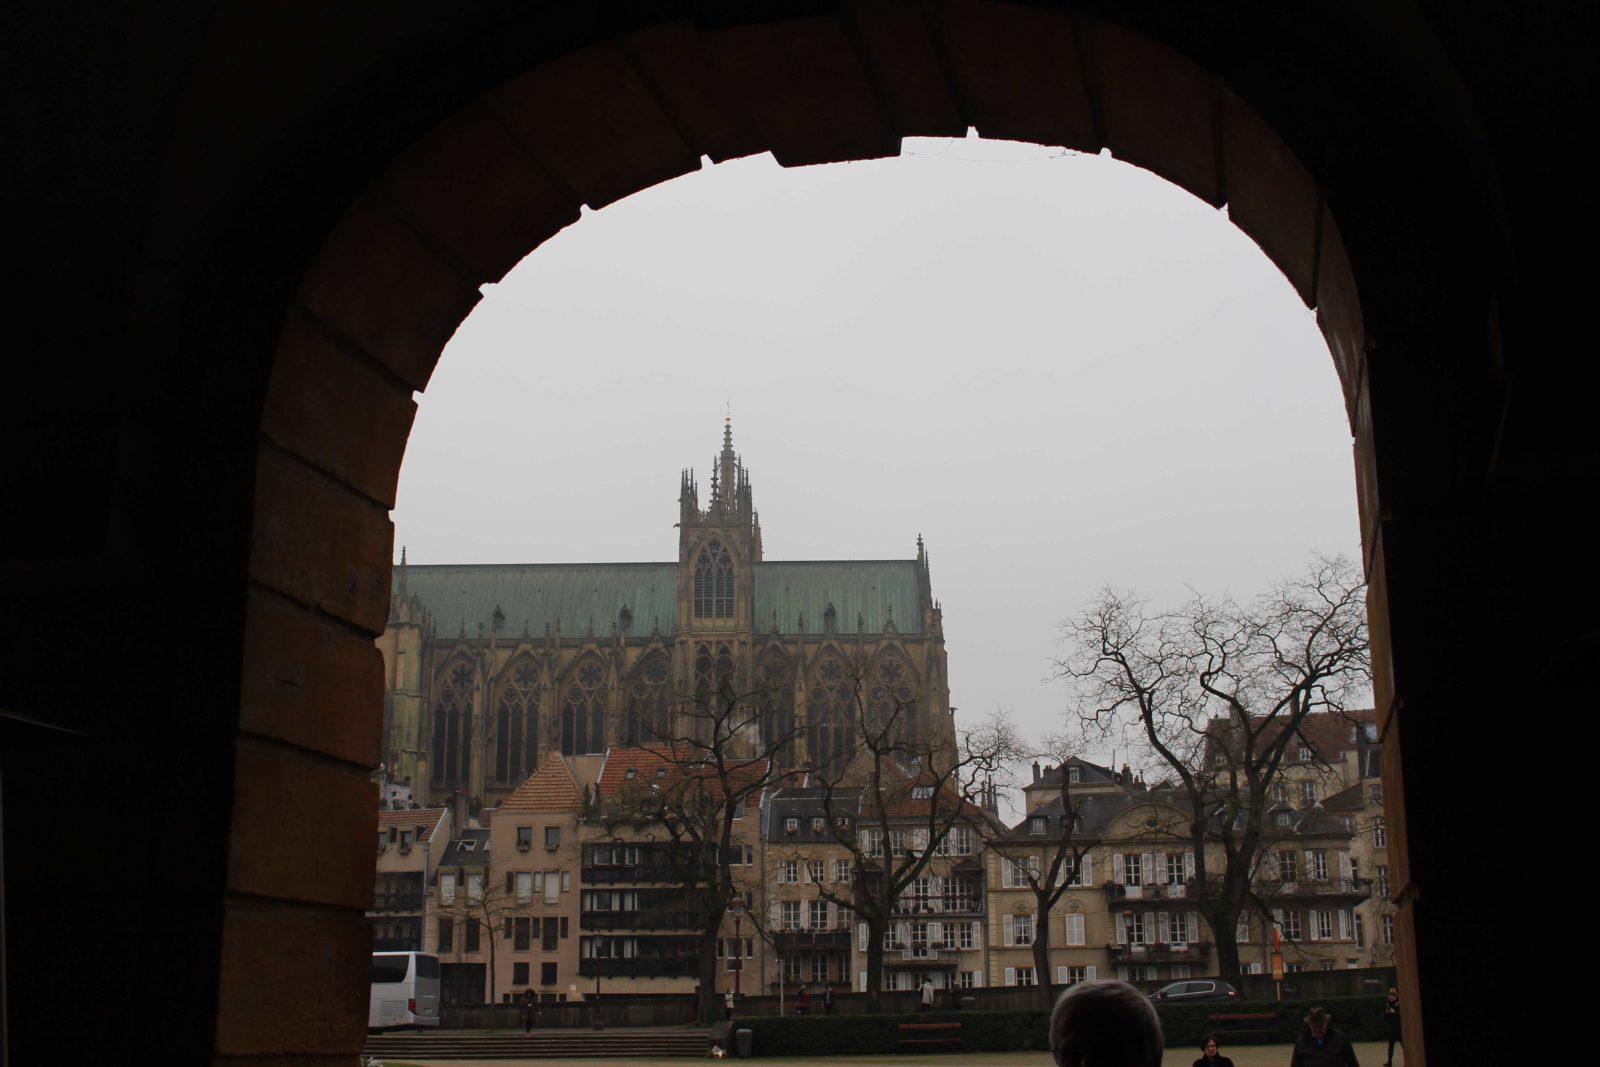 Metz cathédrale de jour